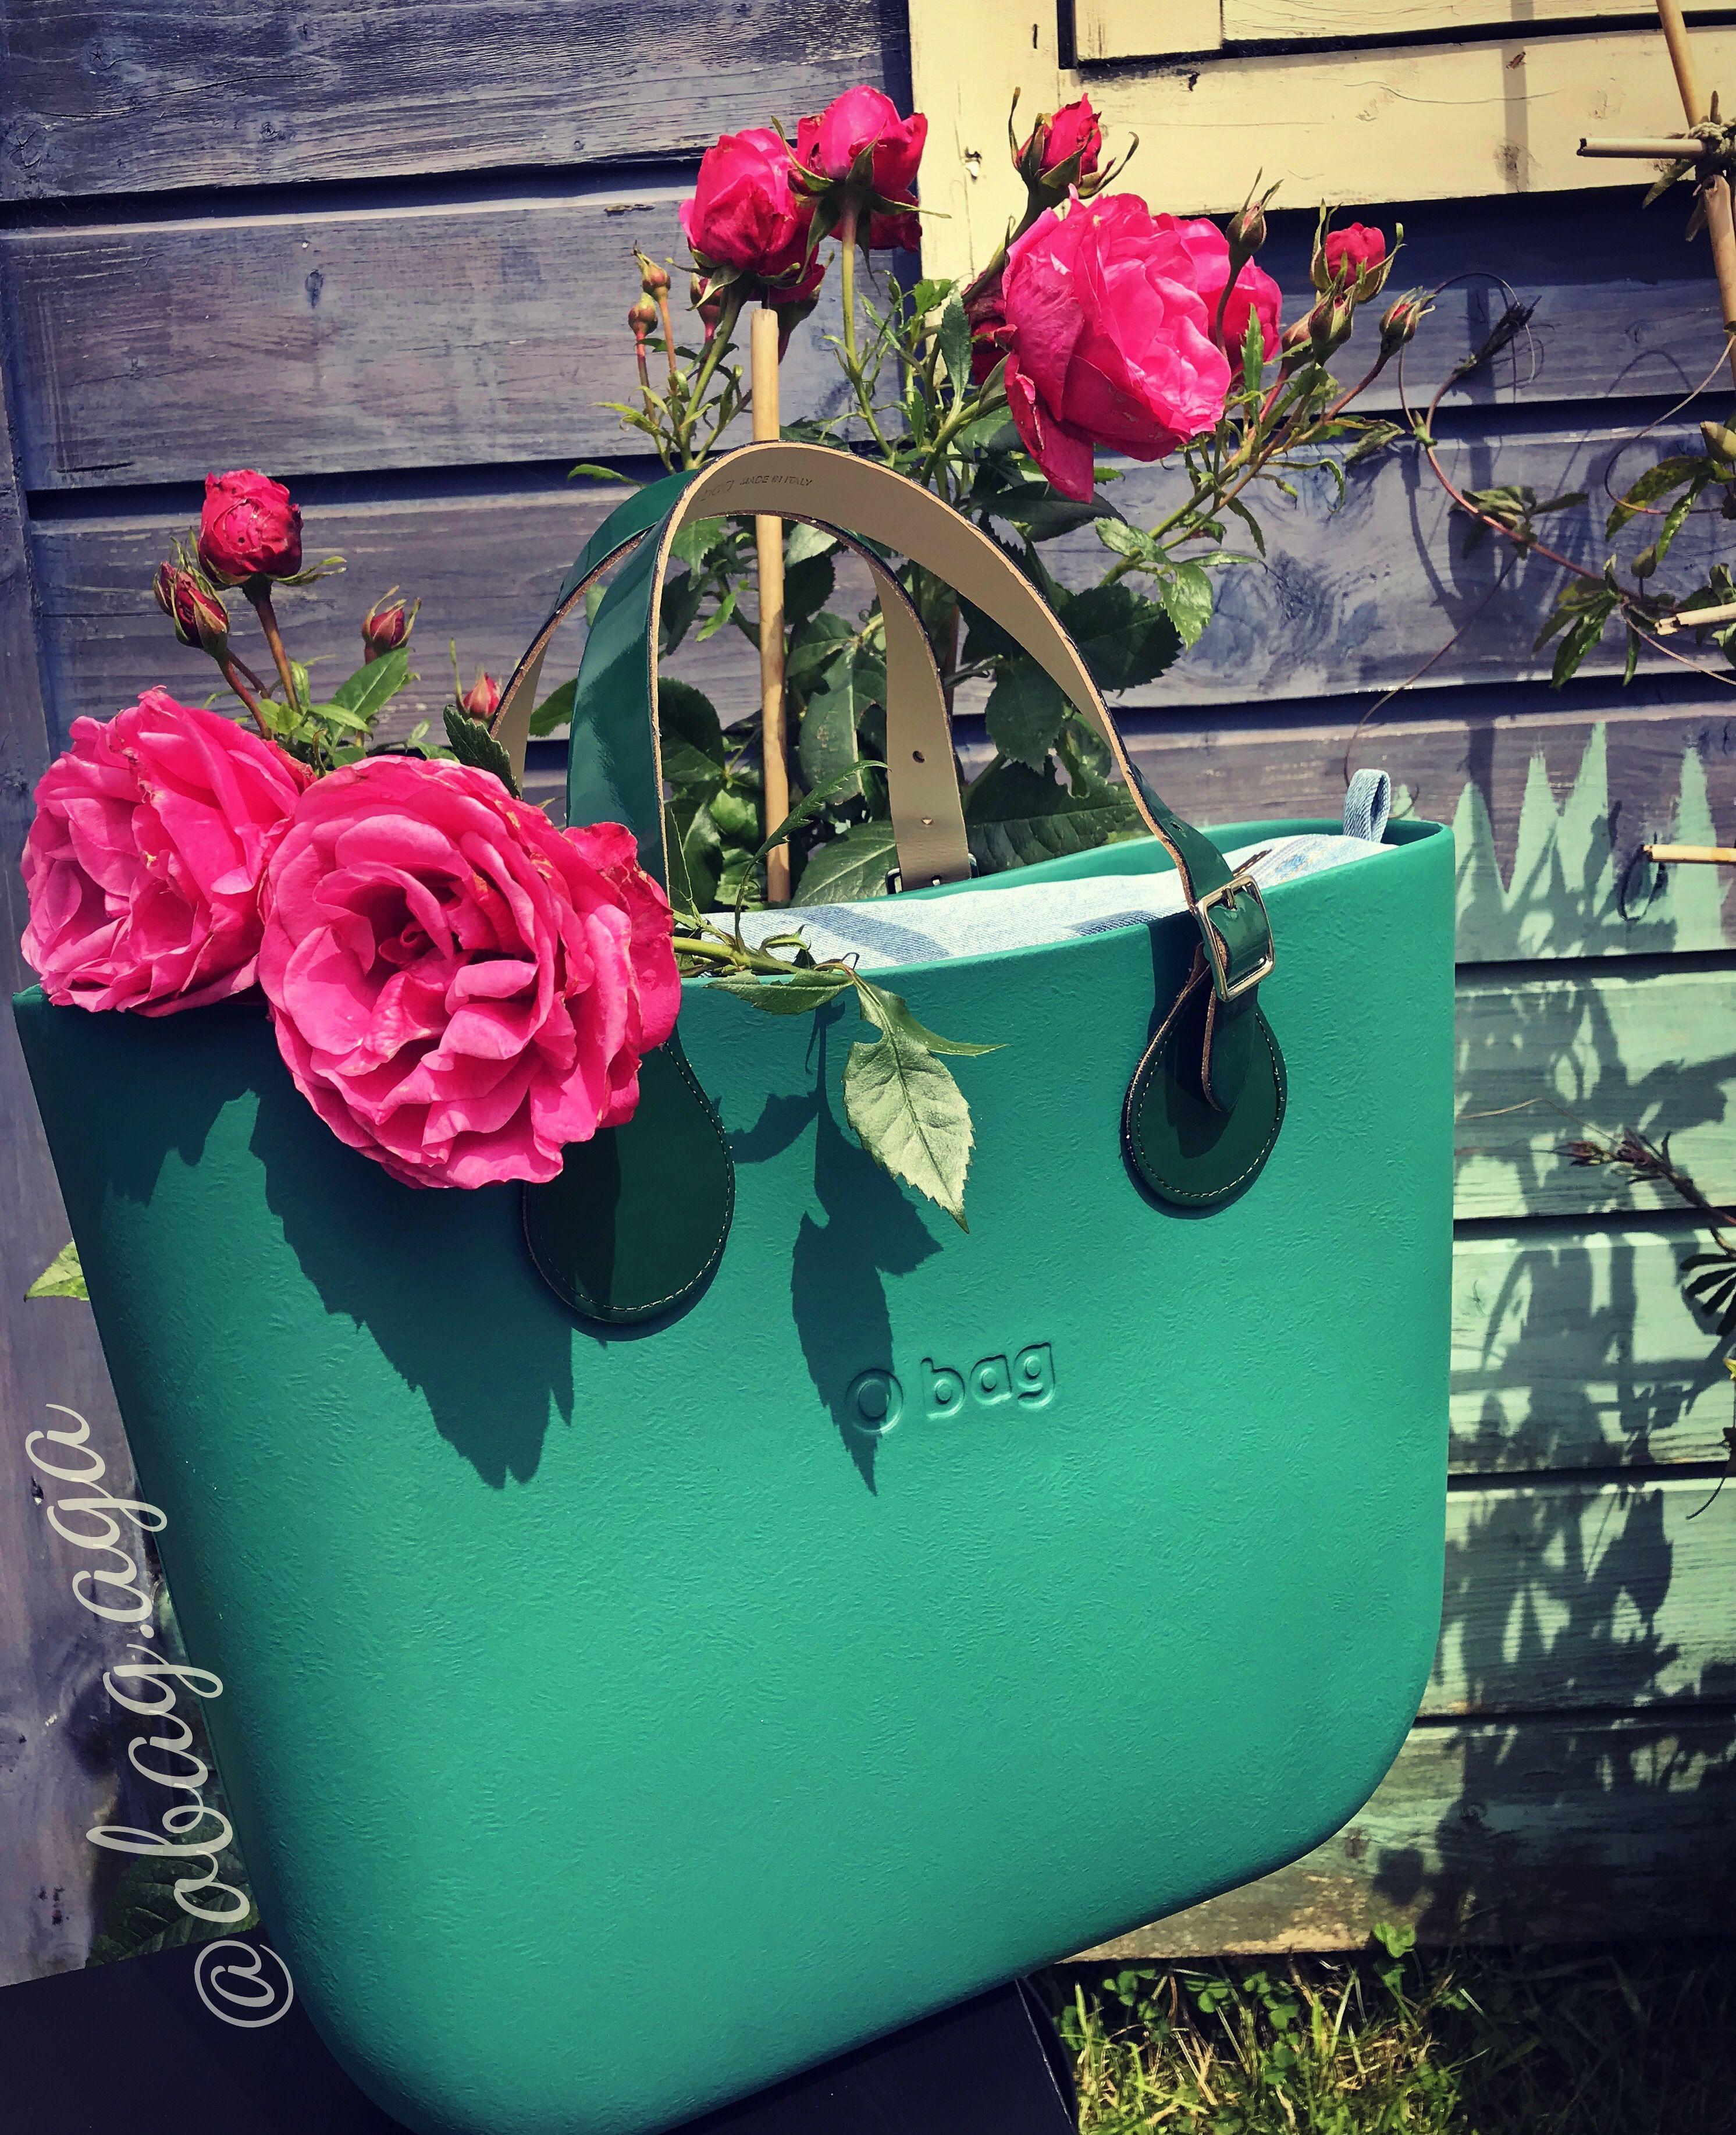 Https Www Instagram Com Obag Aga O Bag Bags Top Handle Bag